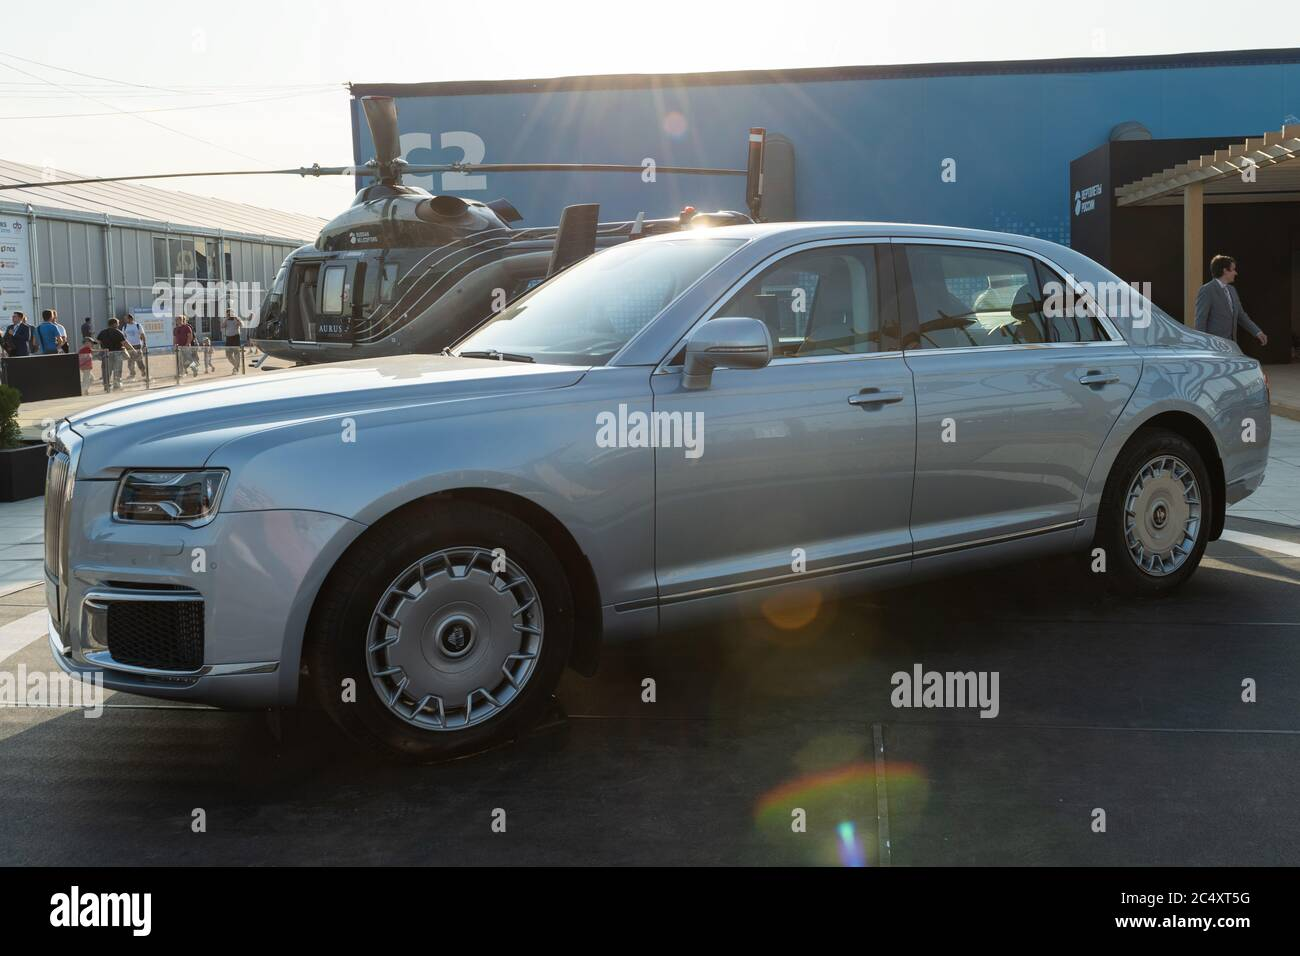 30 Agosto 2019. Zhukovsky, Russia. Auto esecutiva russa Aurus Senat all'International Aviation and Space Salon MAKS 2019. Foto Stock